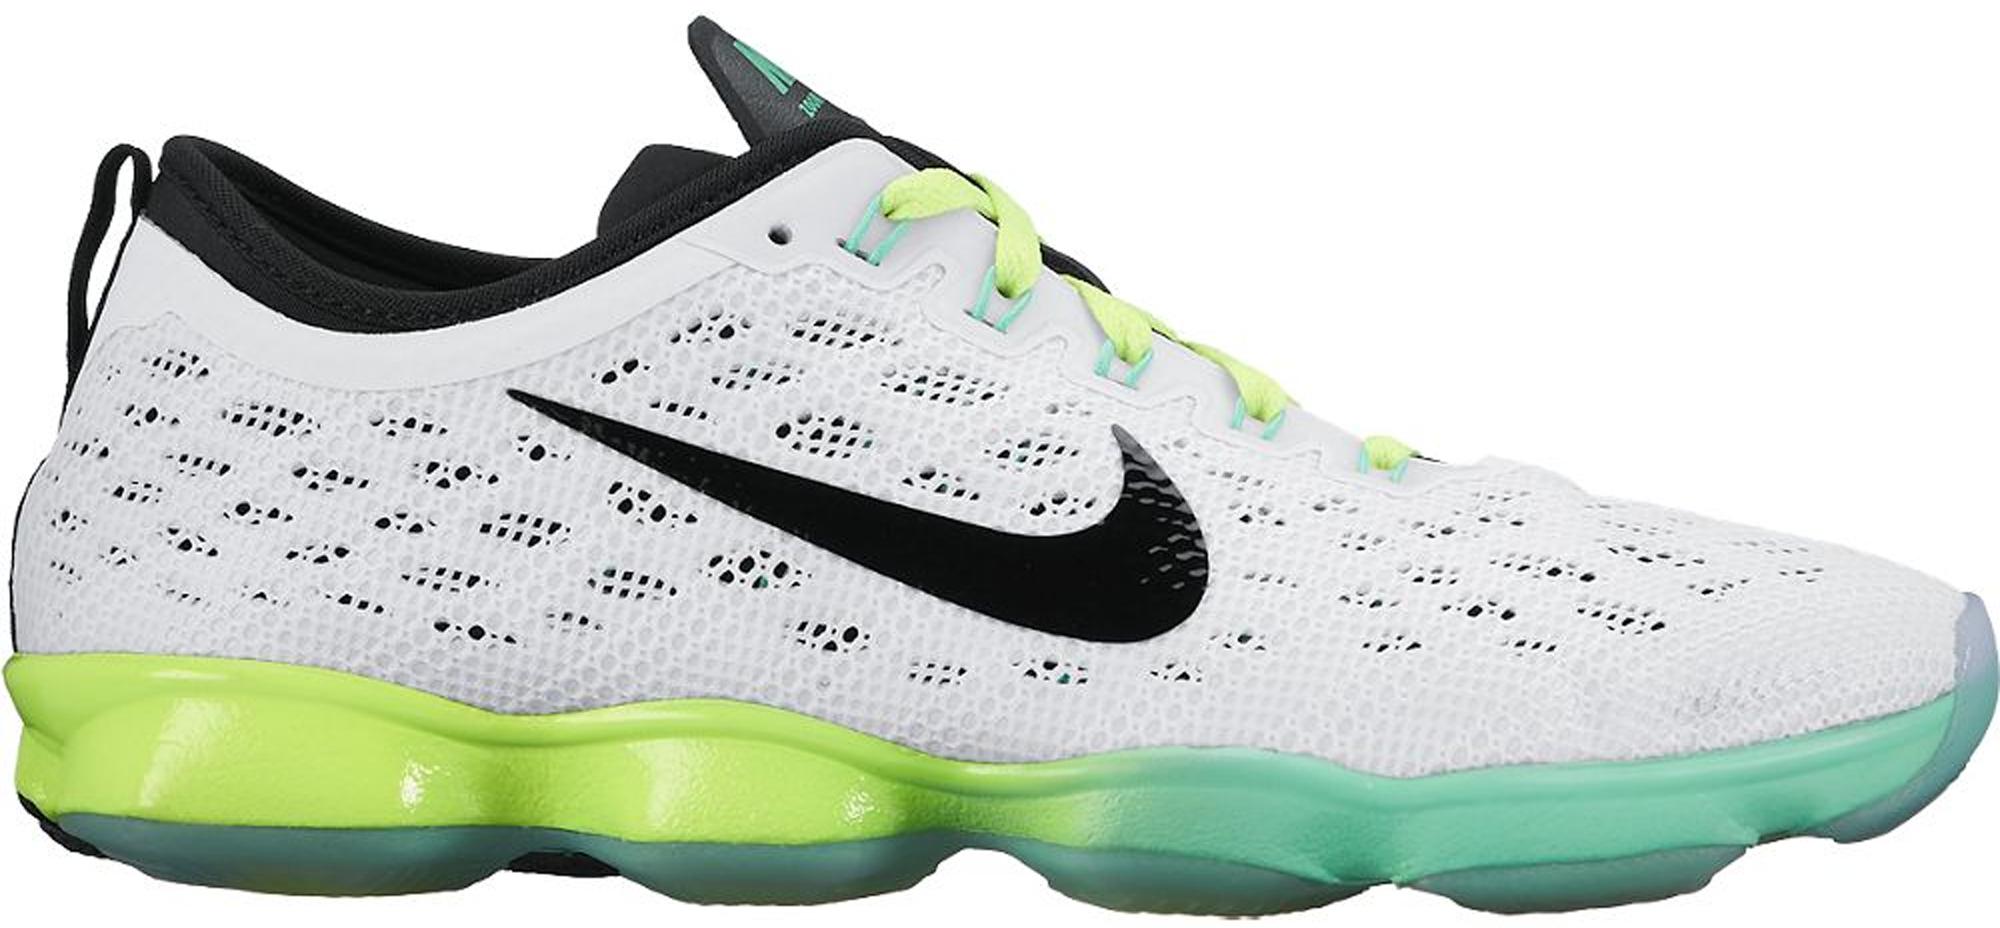 Nike Zoom Fit Agility White Black Green